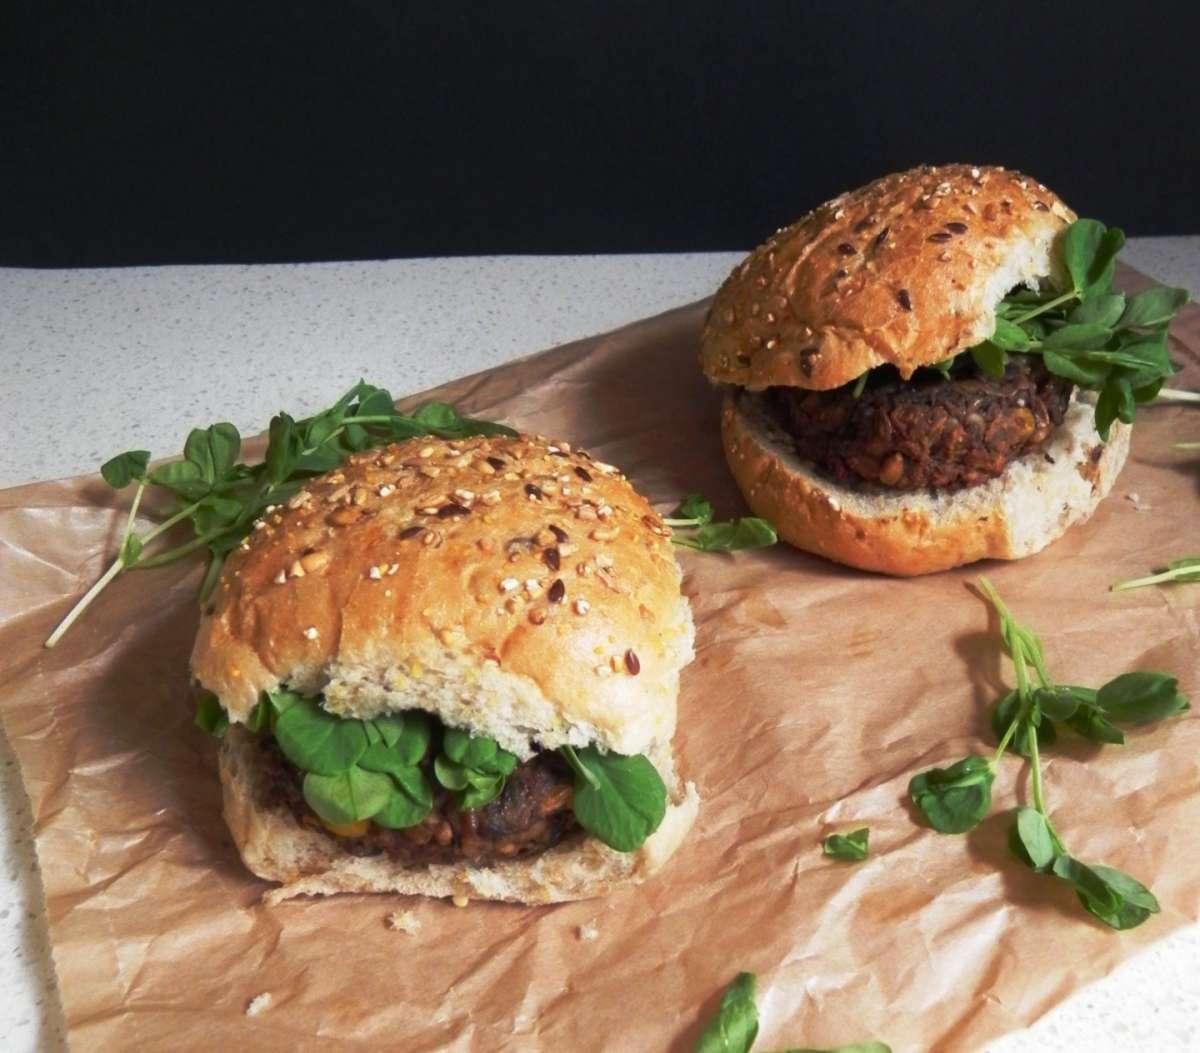 Burger di lenticchie e funghi